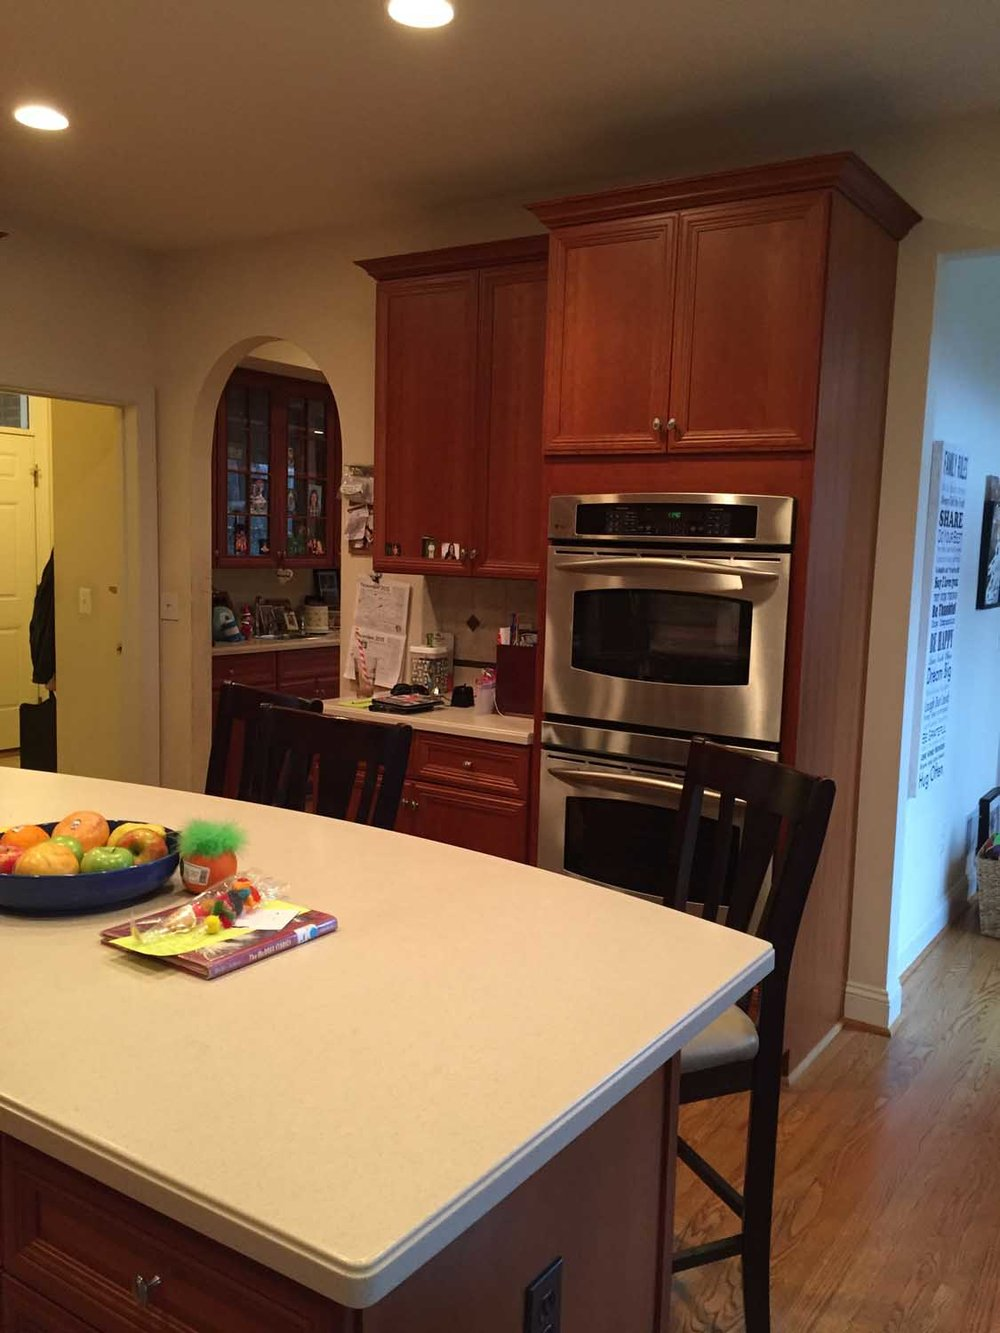 Howard County Maryland Transitional Kitchen Remodel Before 2 – Designer Bestie April Force Pardoe Interiors.jpg